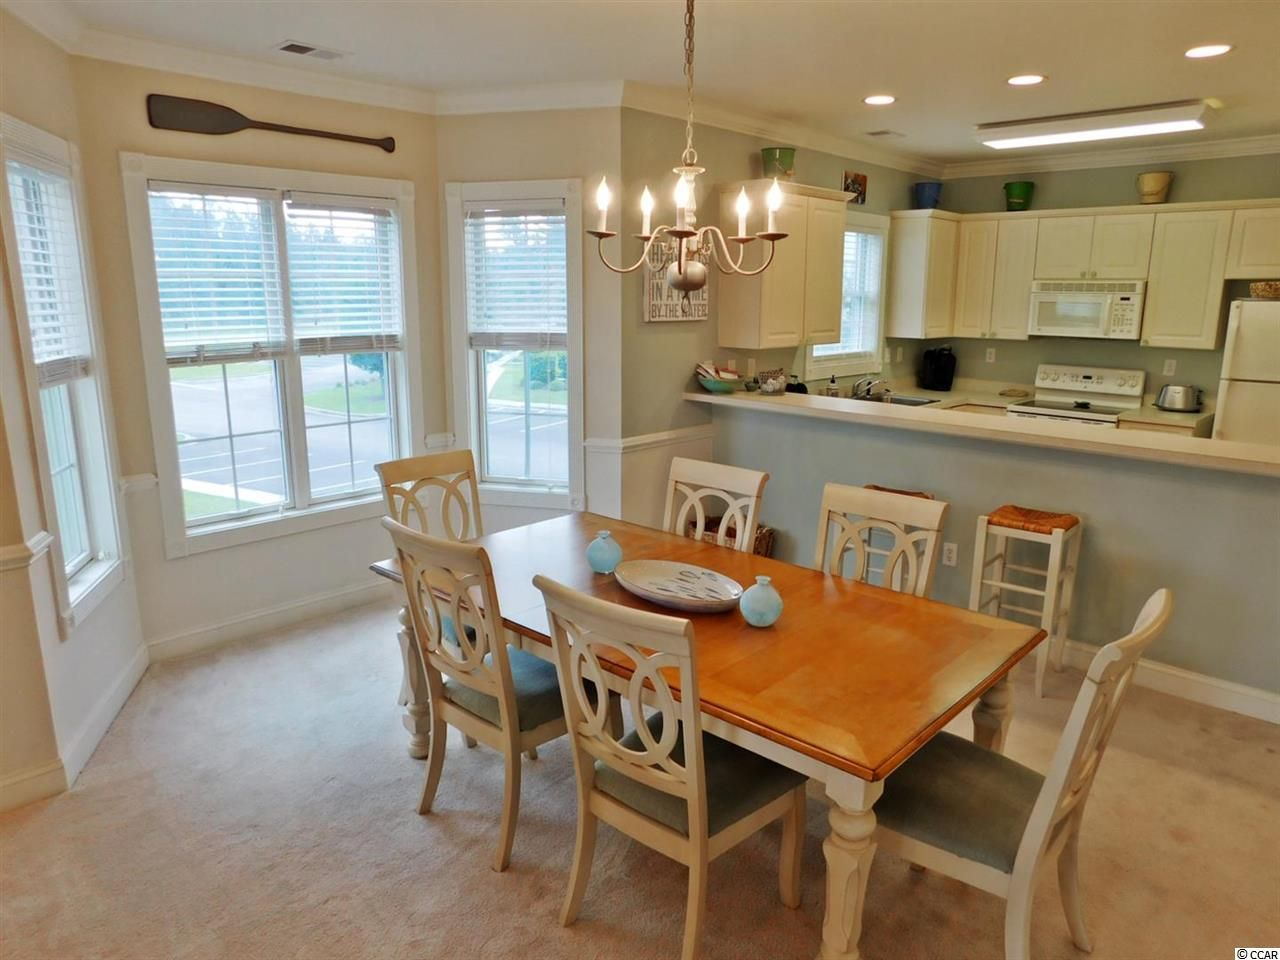 4812 Magnolia Lake Drive, Myrtle Beach, SC Home decor